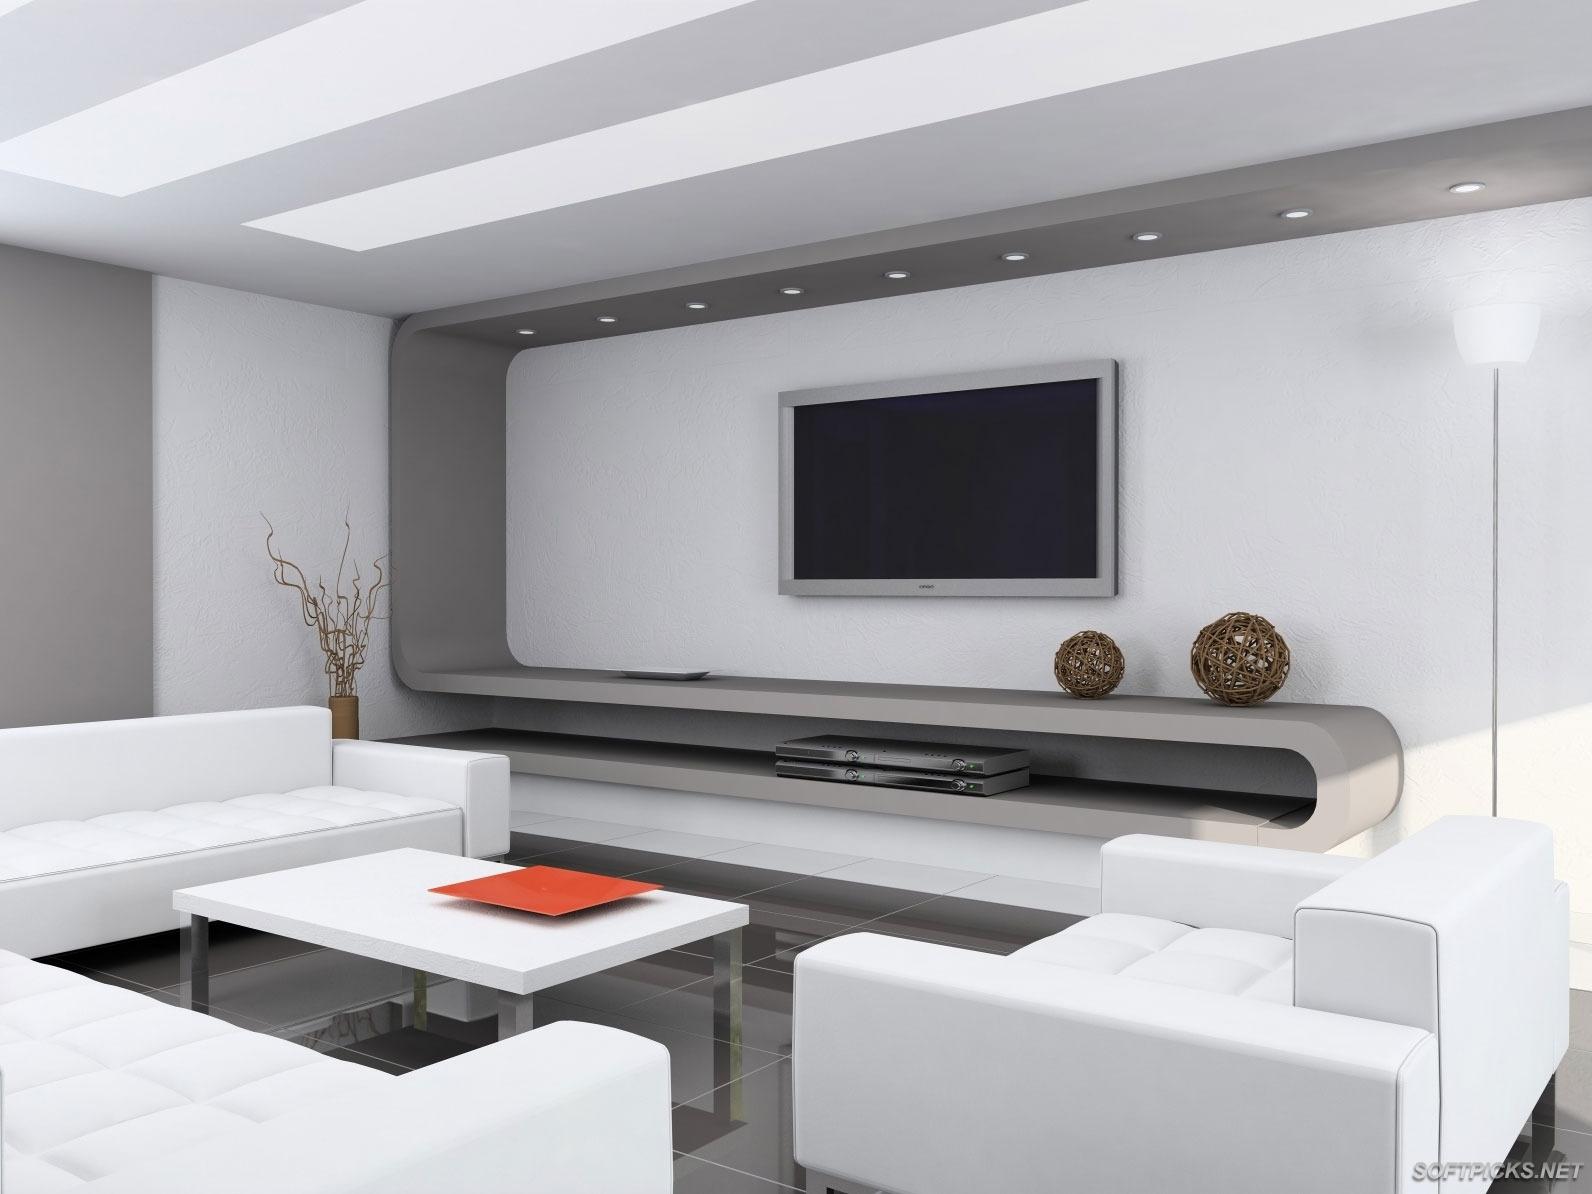 Plaster ceiling renovation interior design renovation work